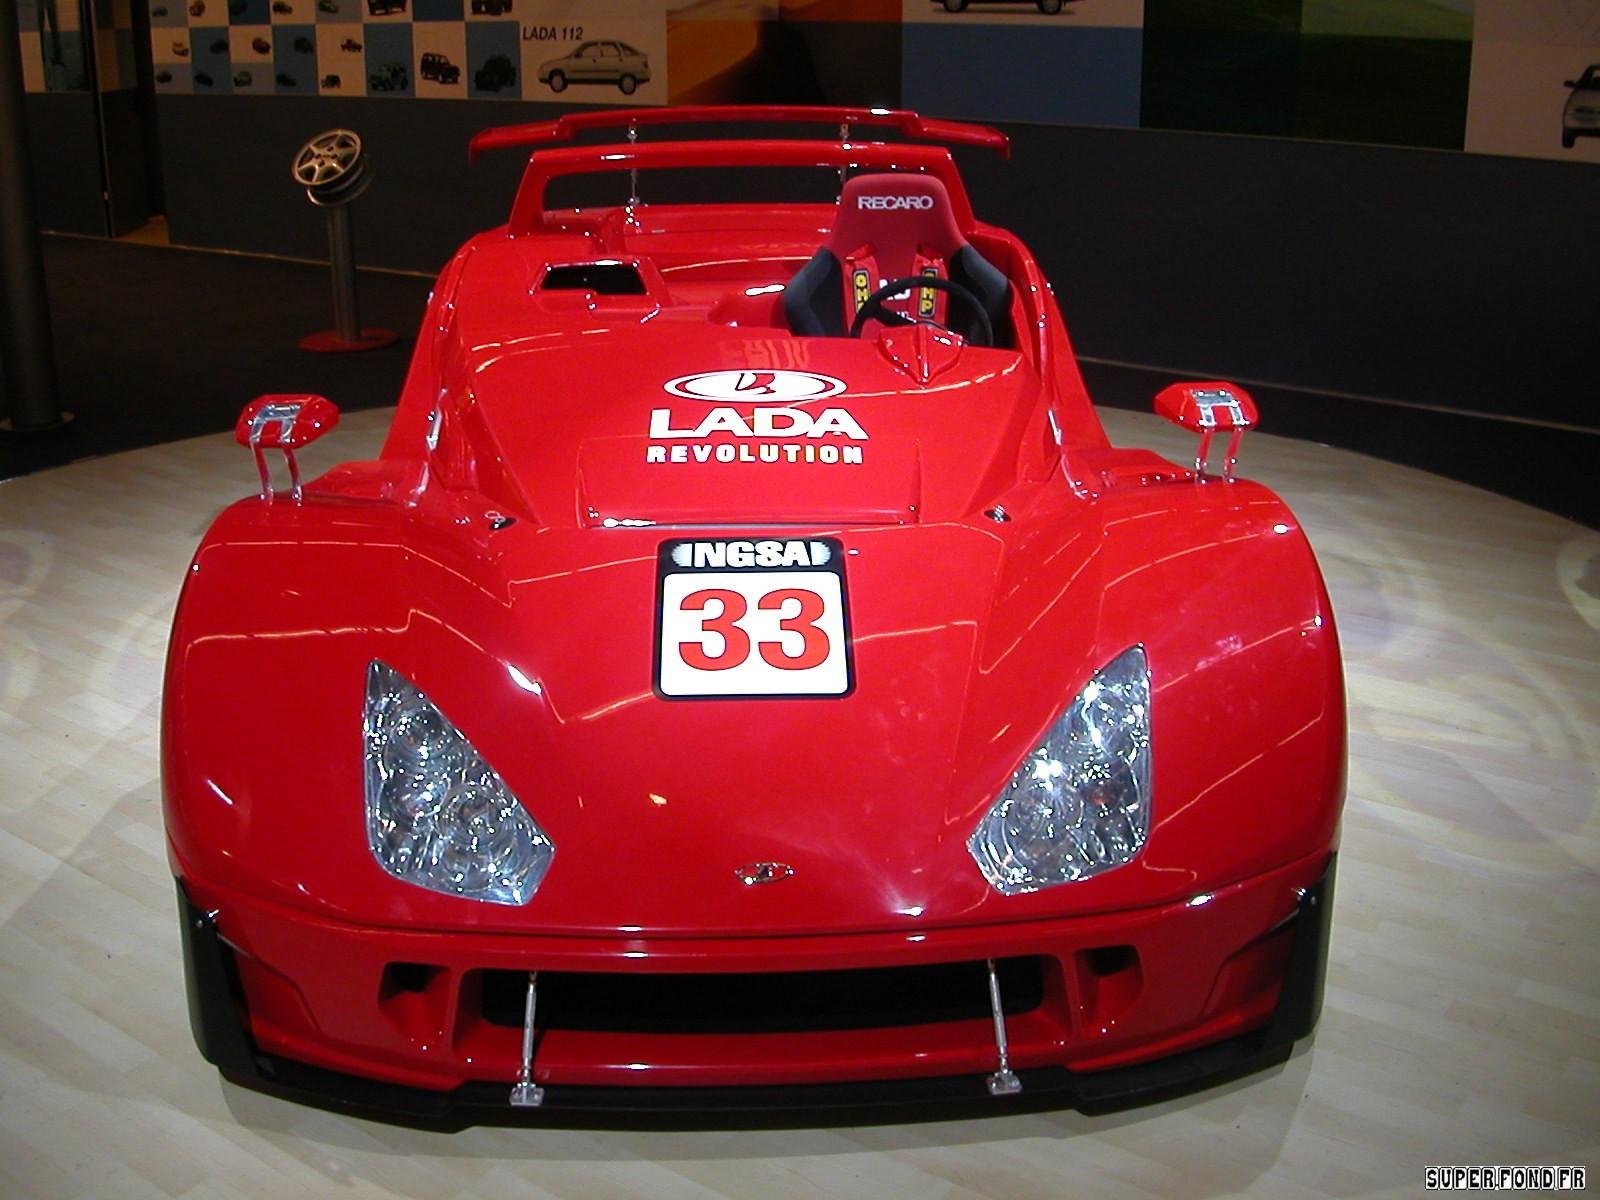 2003 Lada Révolution